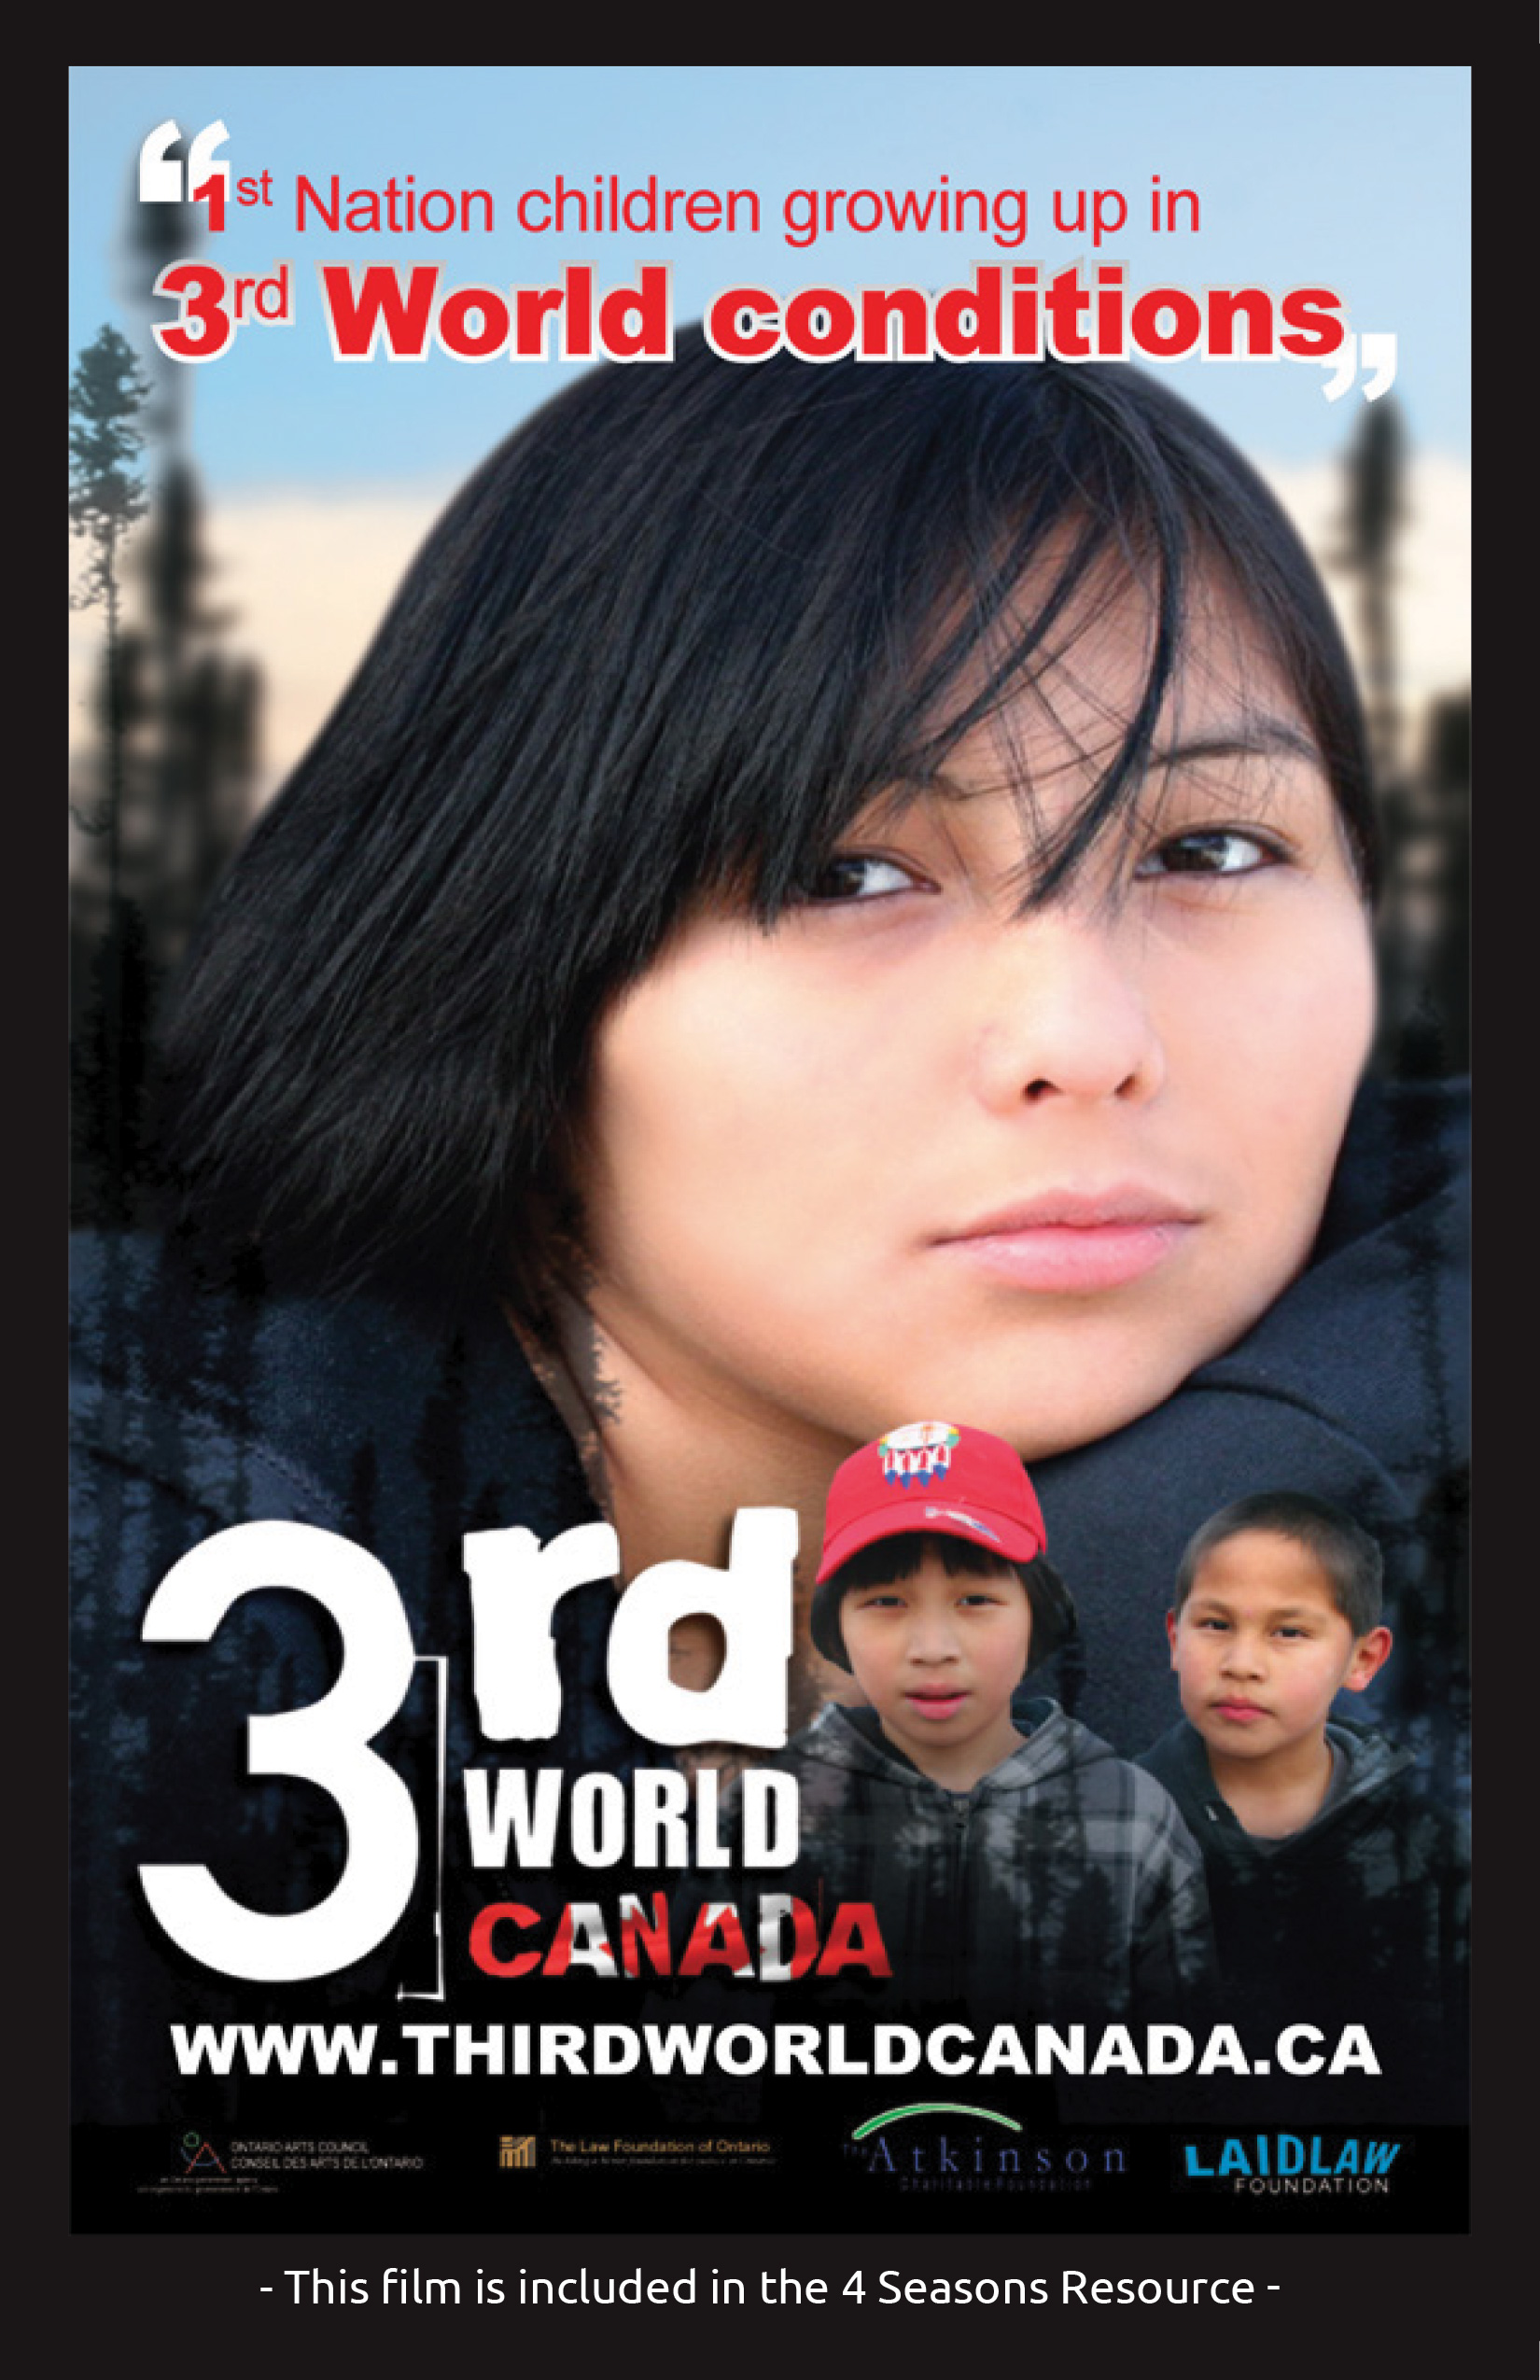 3rd_world_canada_brochure